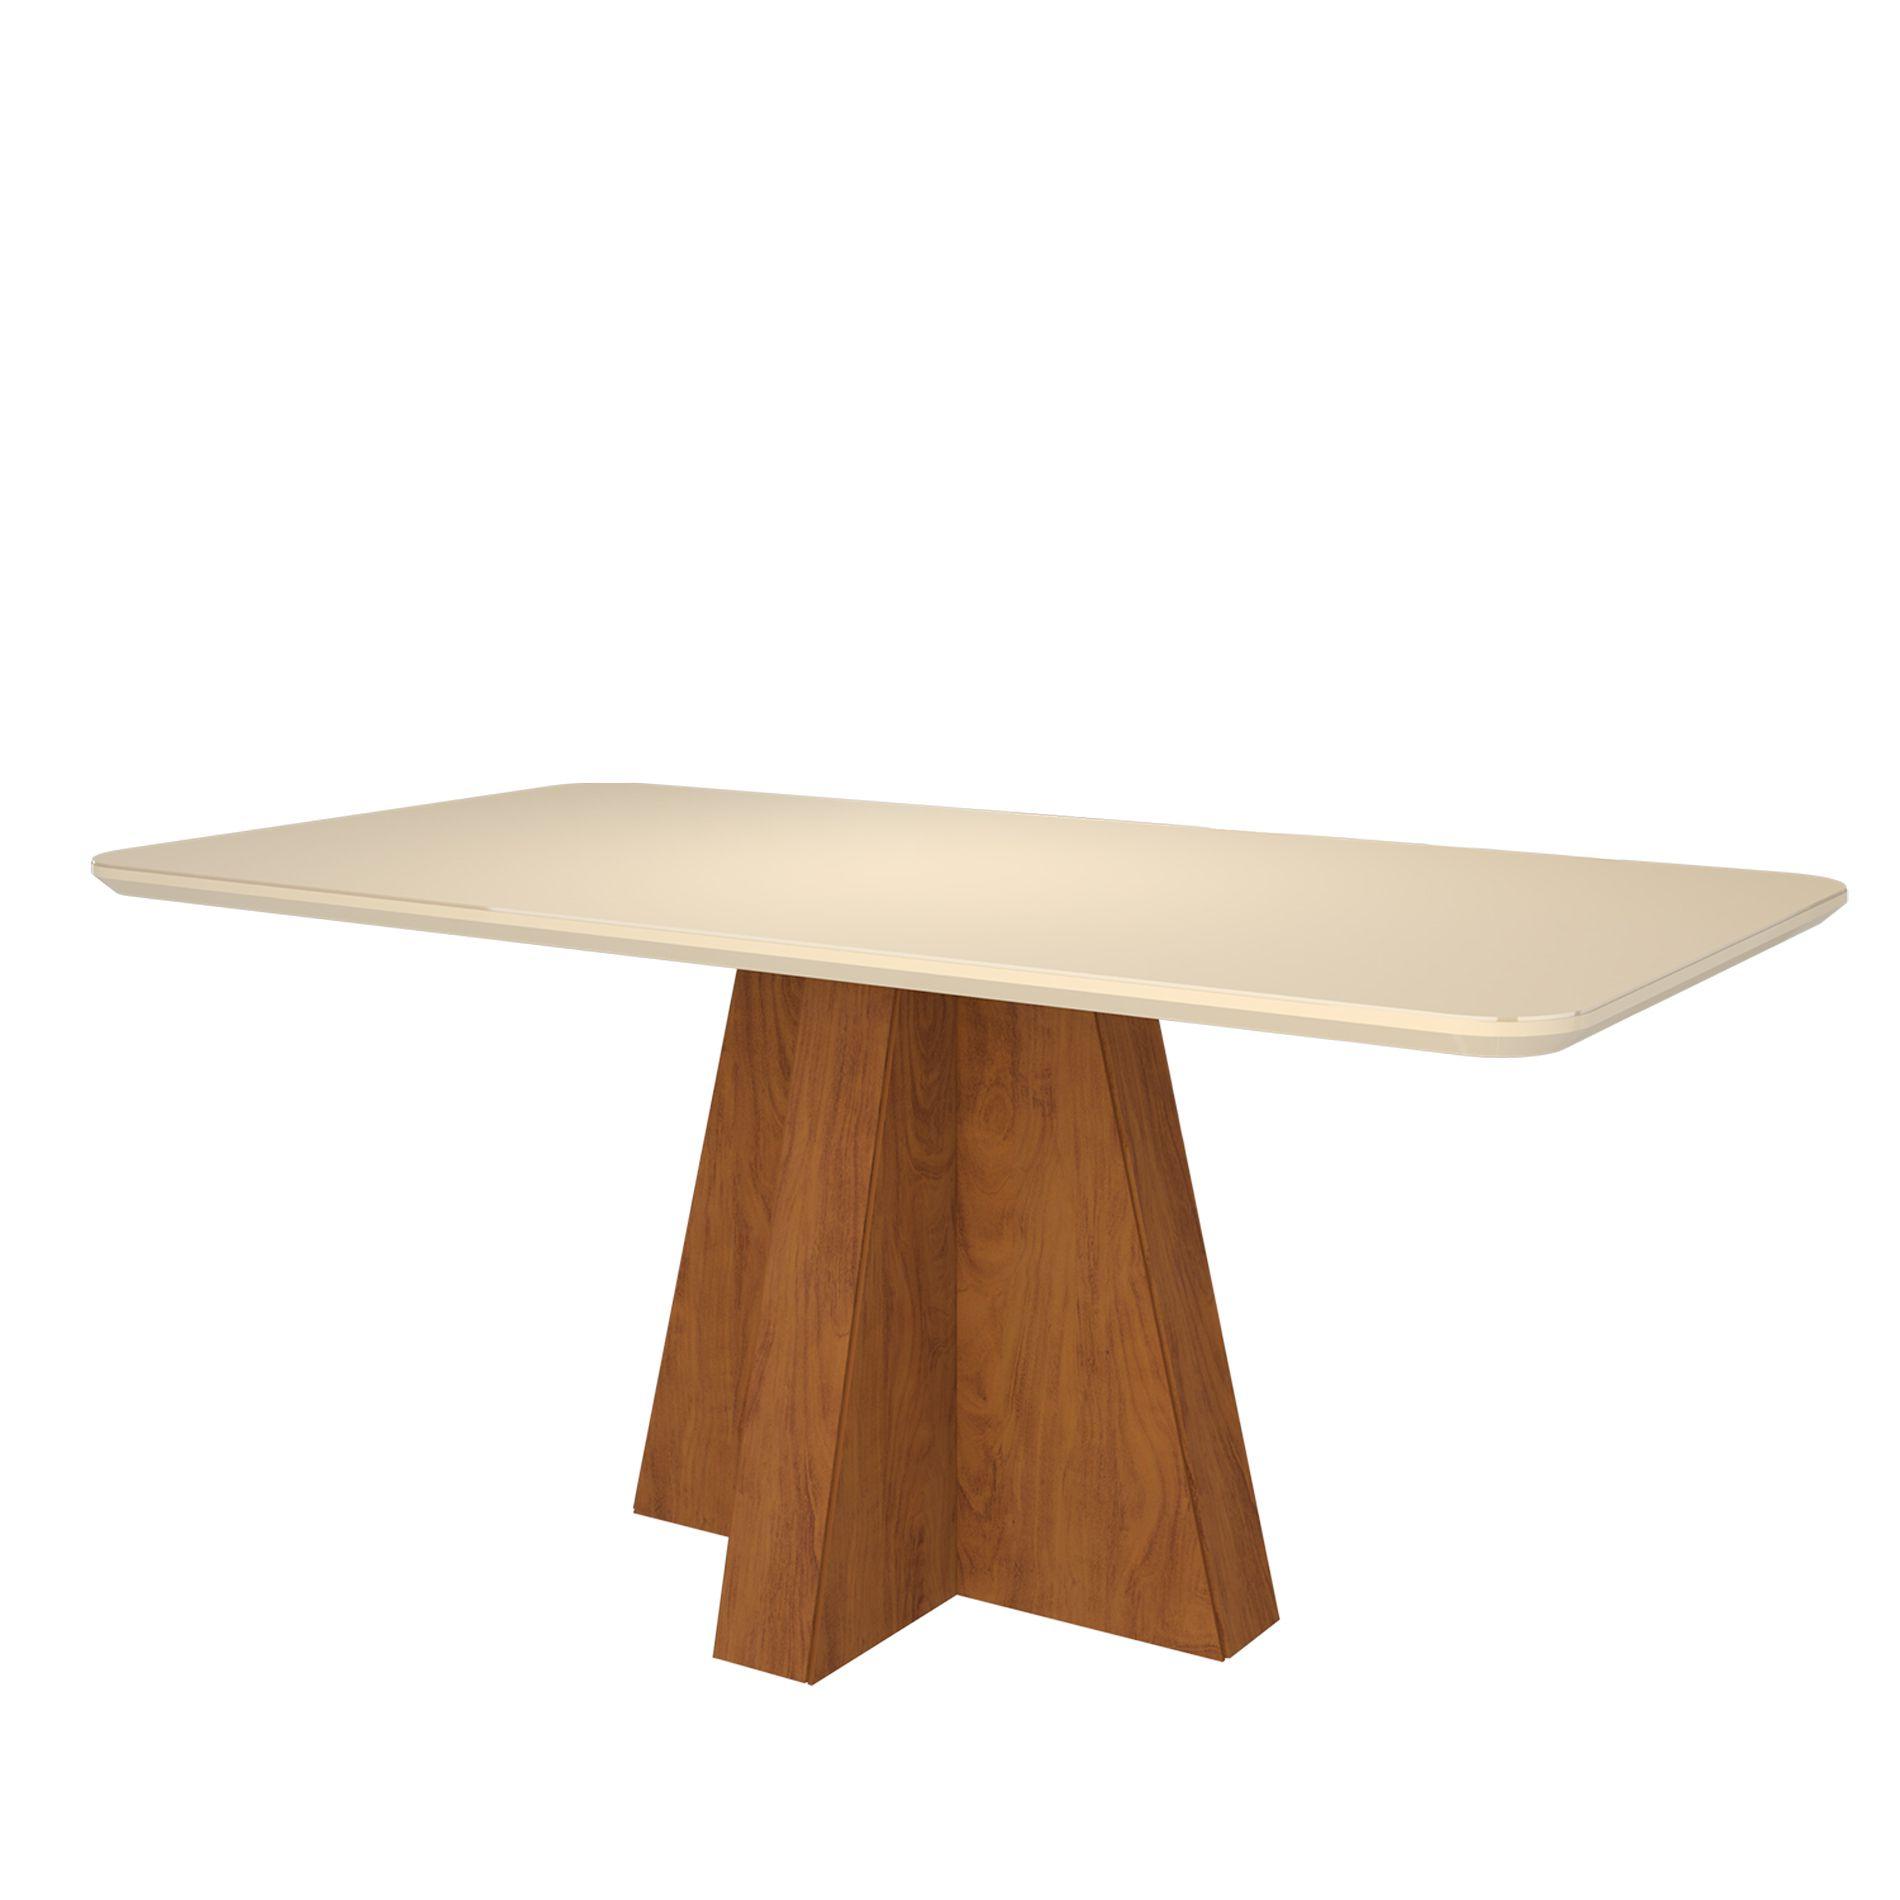 Mesa para Sala de Jantar Maite 160 x 80 cm e 6 Cadeiras Paola Cimol Savana/Off White/Nude